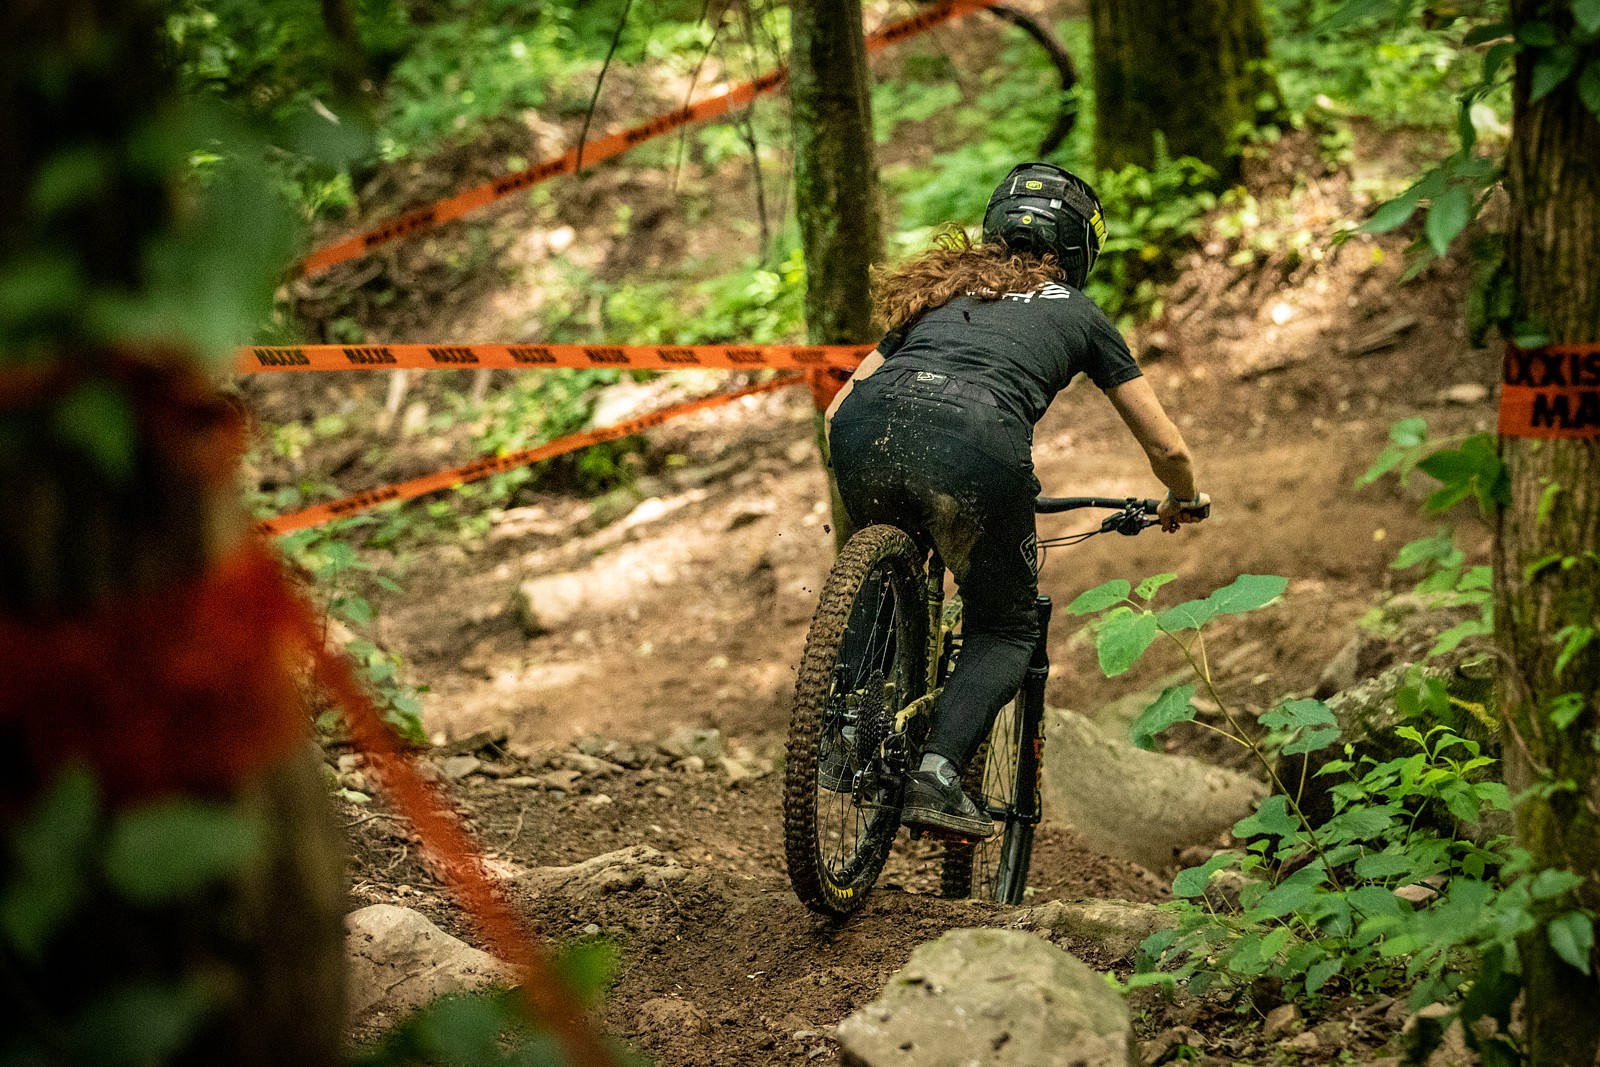 Rachel Kelleher - JackRice - Mountain Biking Pictures - Vital MTB